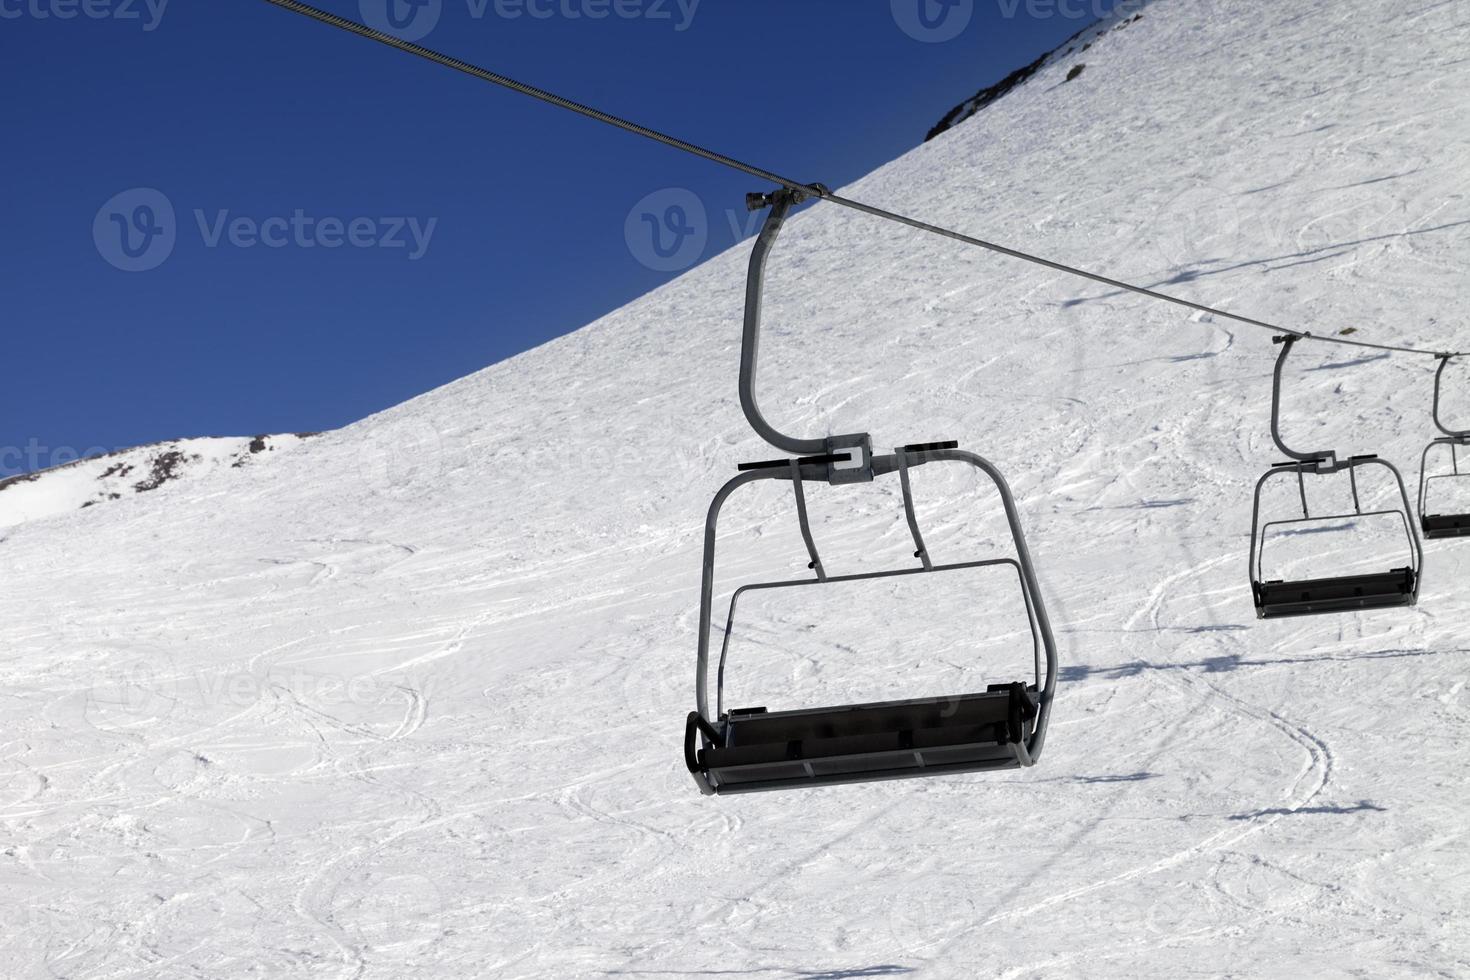 Chair-lift at ski resort photo